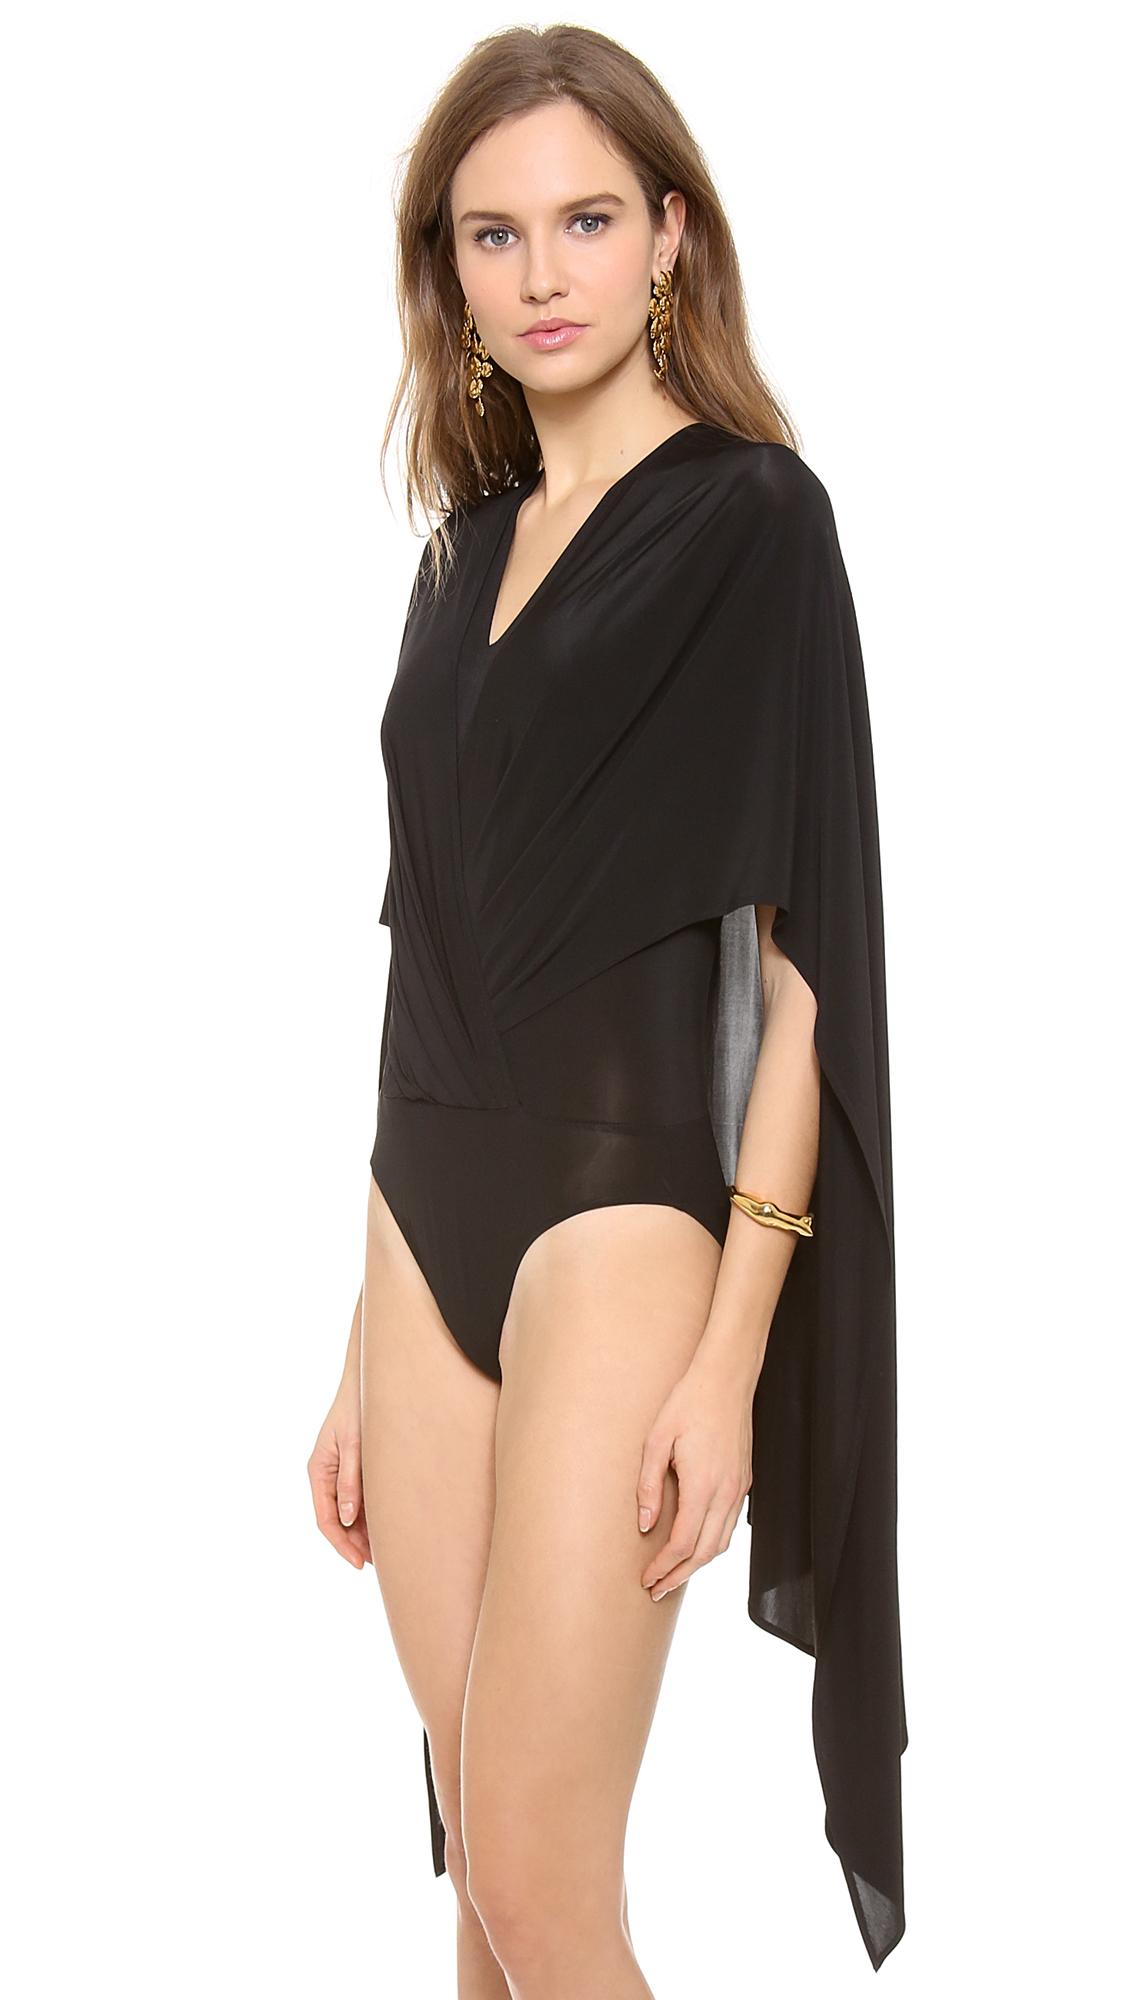 Gallery - Donna Karan Sleeveless V Cape Bodysuit In Black Lyst